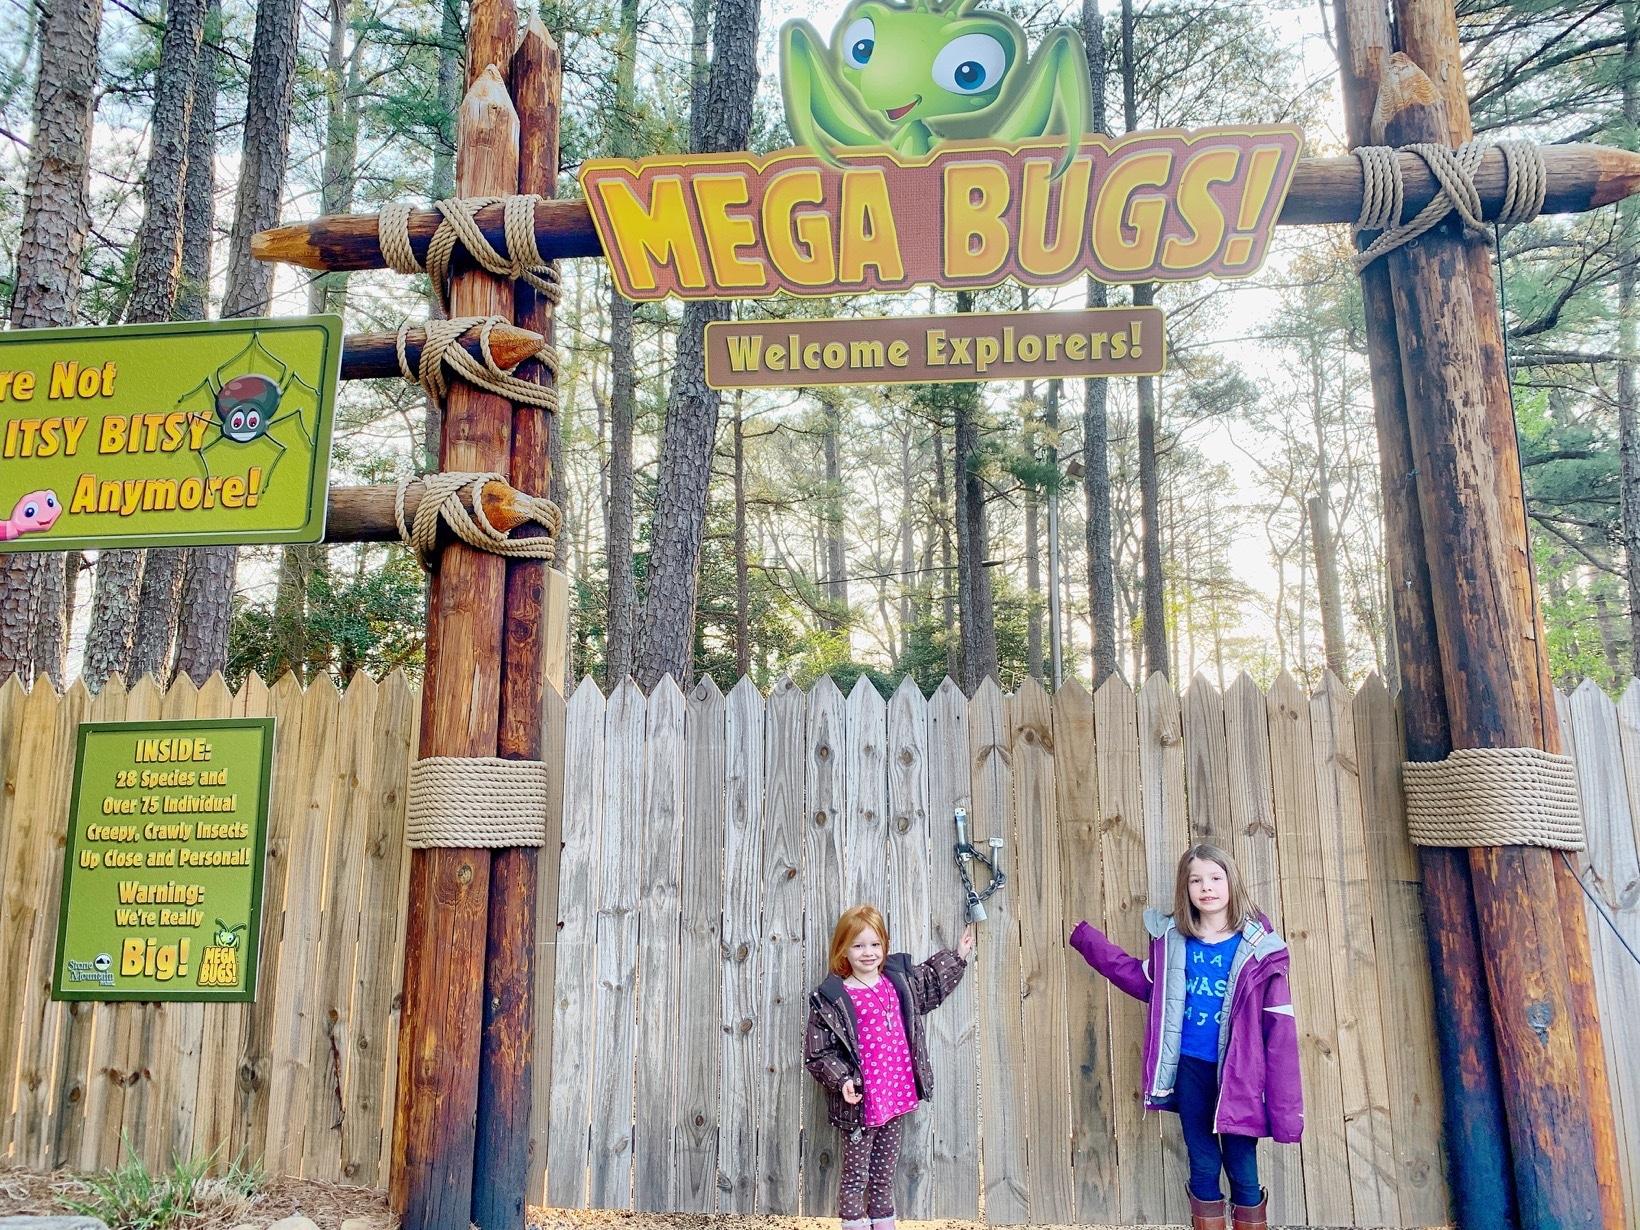 MEGA BUGS at Stone Mountain